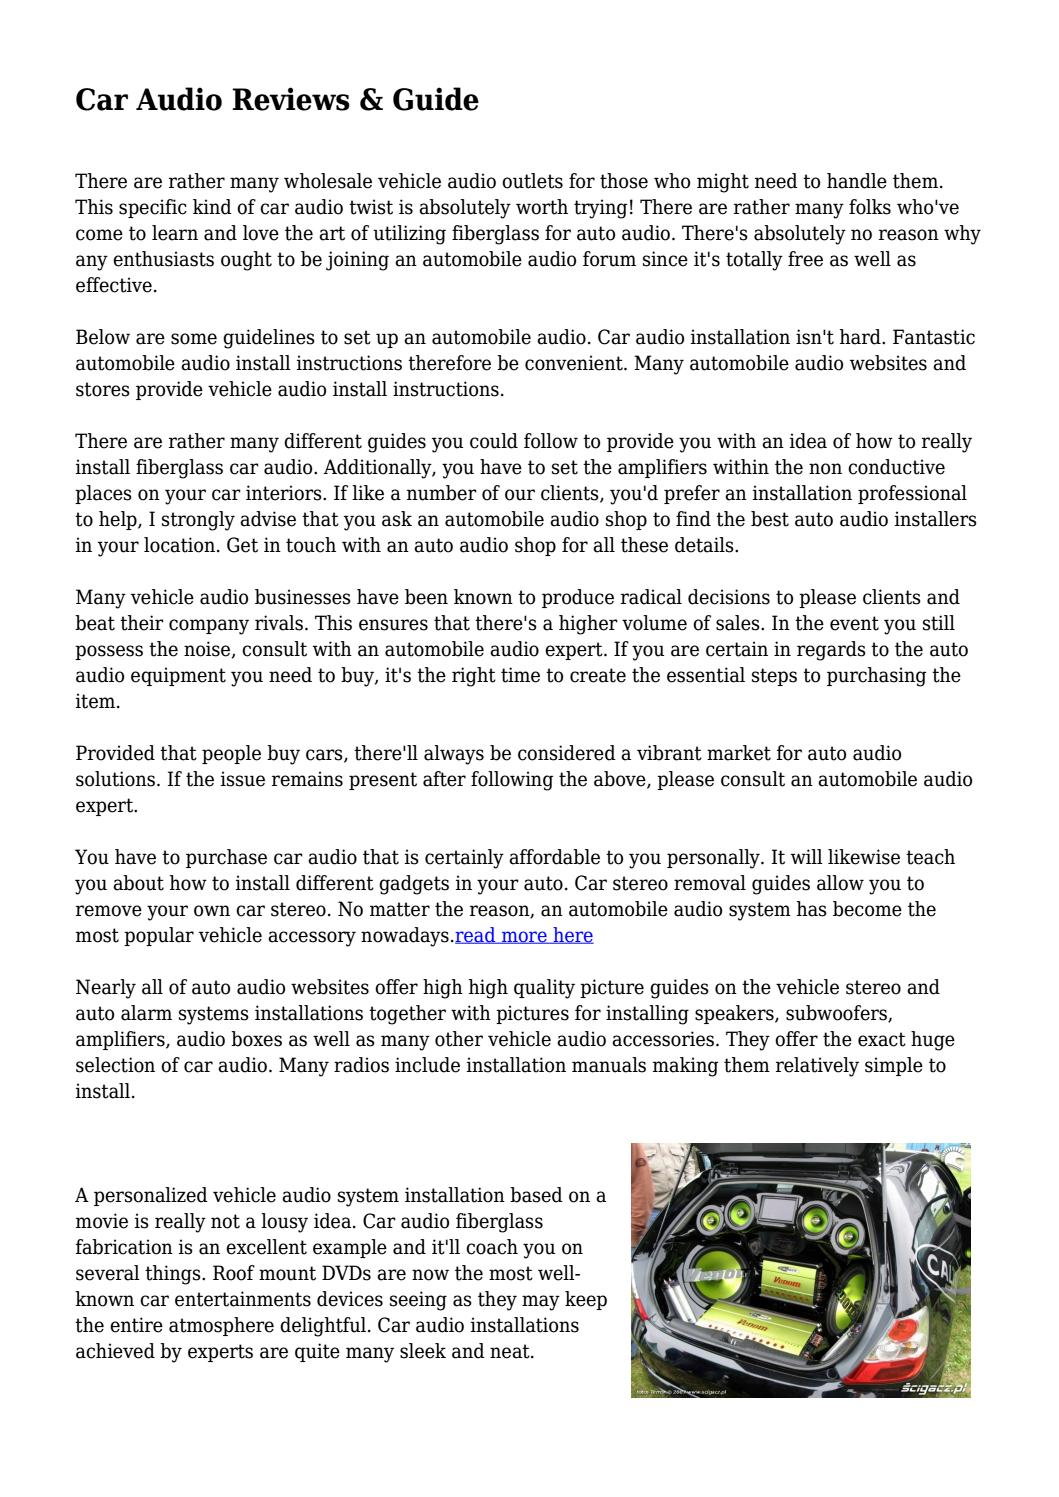 Car Audio Reviews & Guide by caraudioreviewz3 - issuu